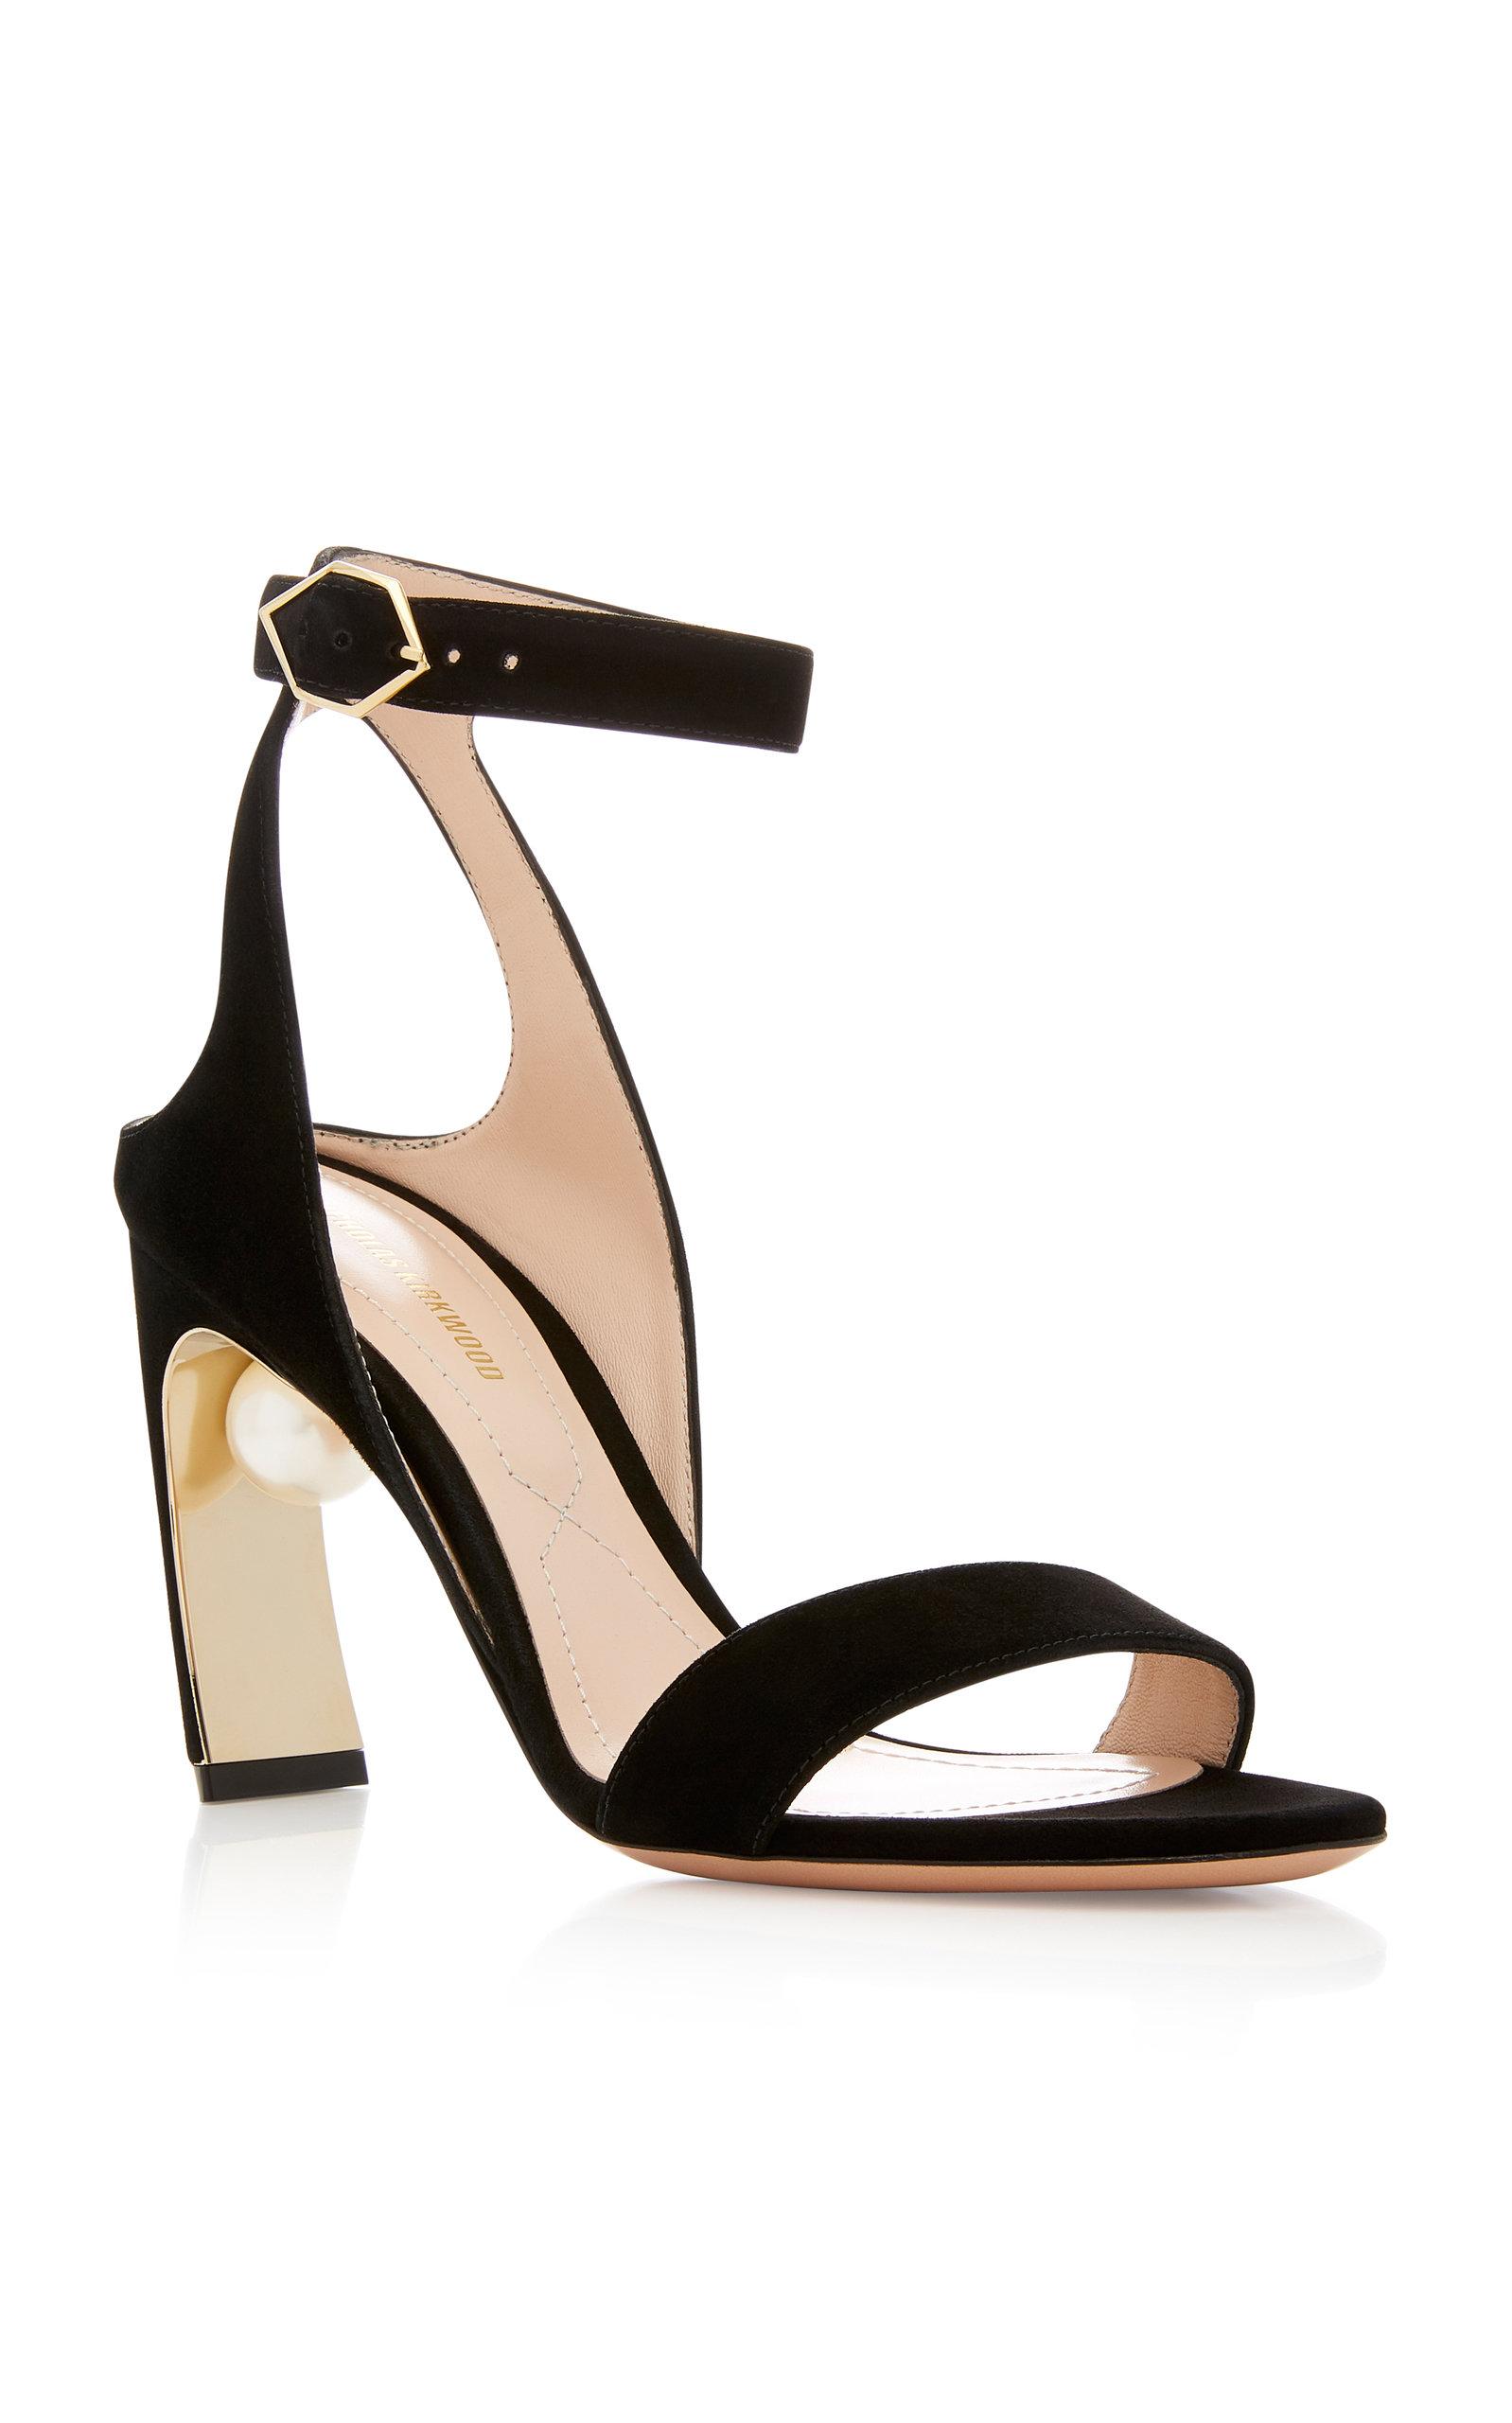 Nicholas Kirkwood Lola Pearl-Embellished Suede Sandals wCf2aM